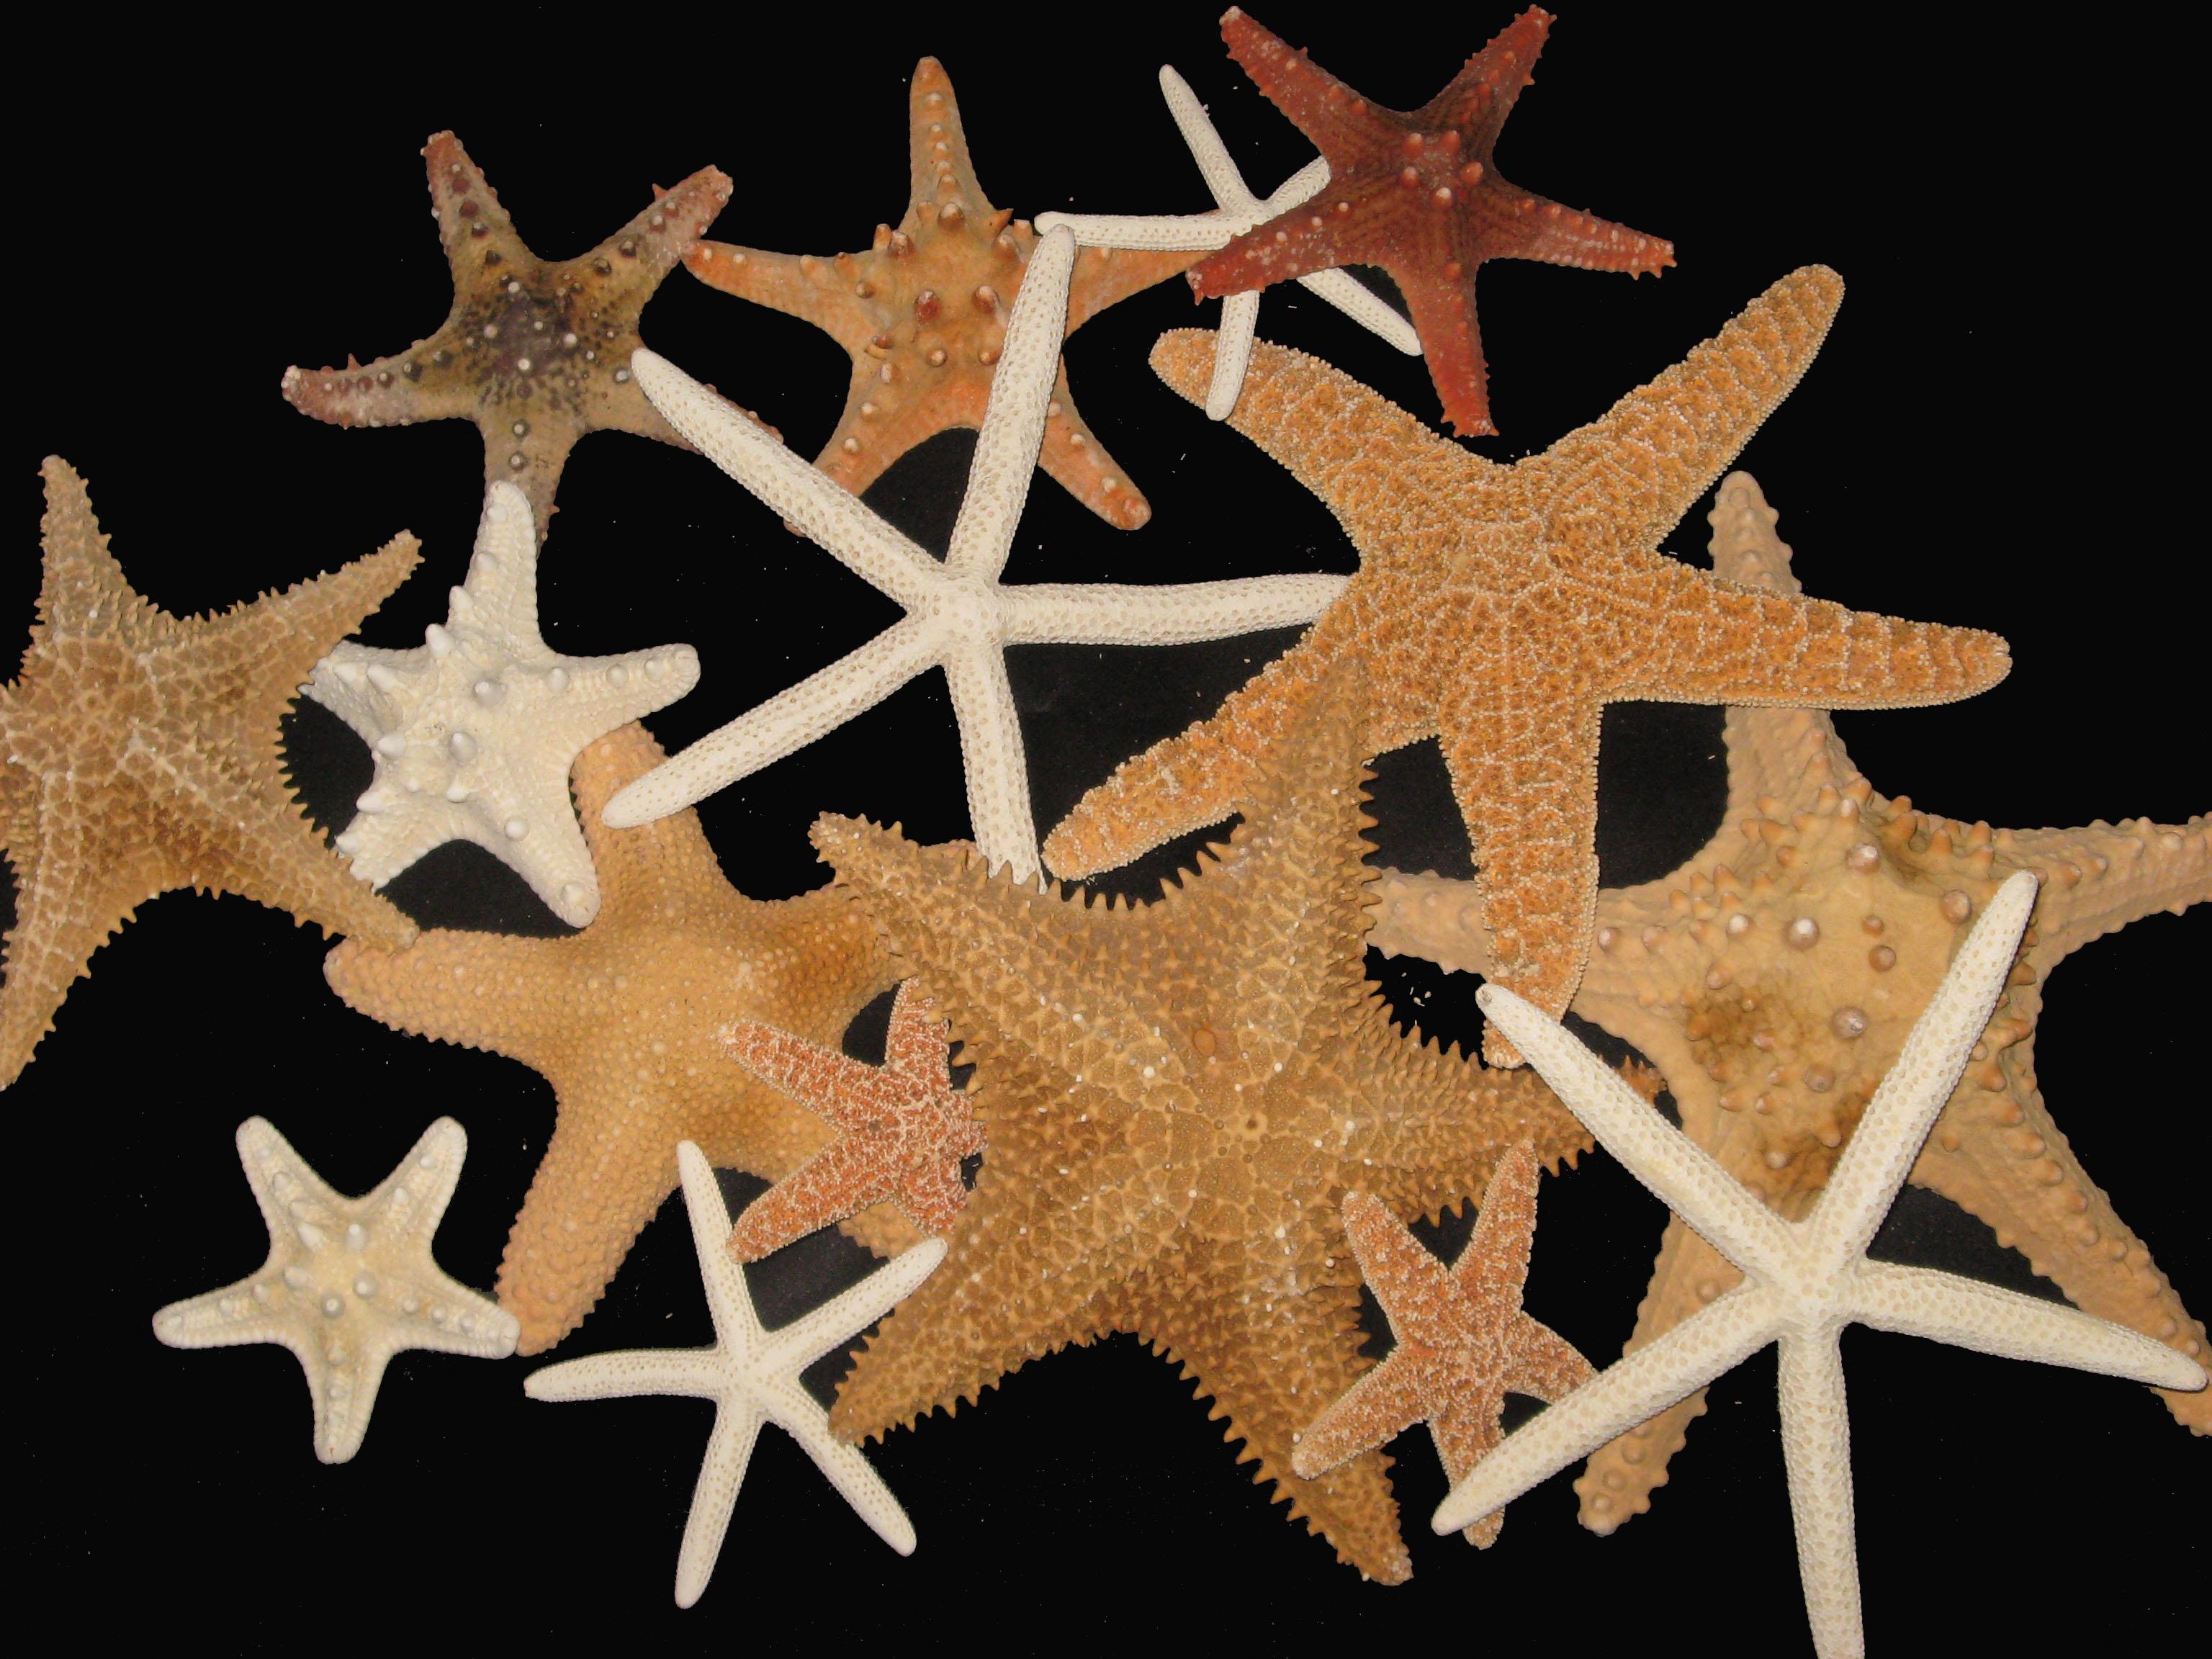 Bulk Starfish Decorations Wholesale Porcupine Sea Beans Sea Cookie Giant Barnacles More